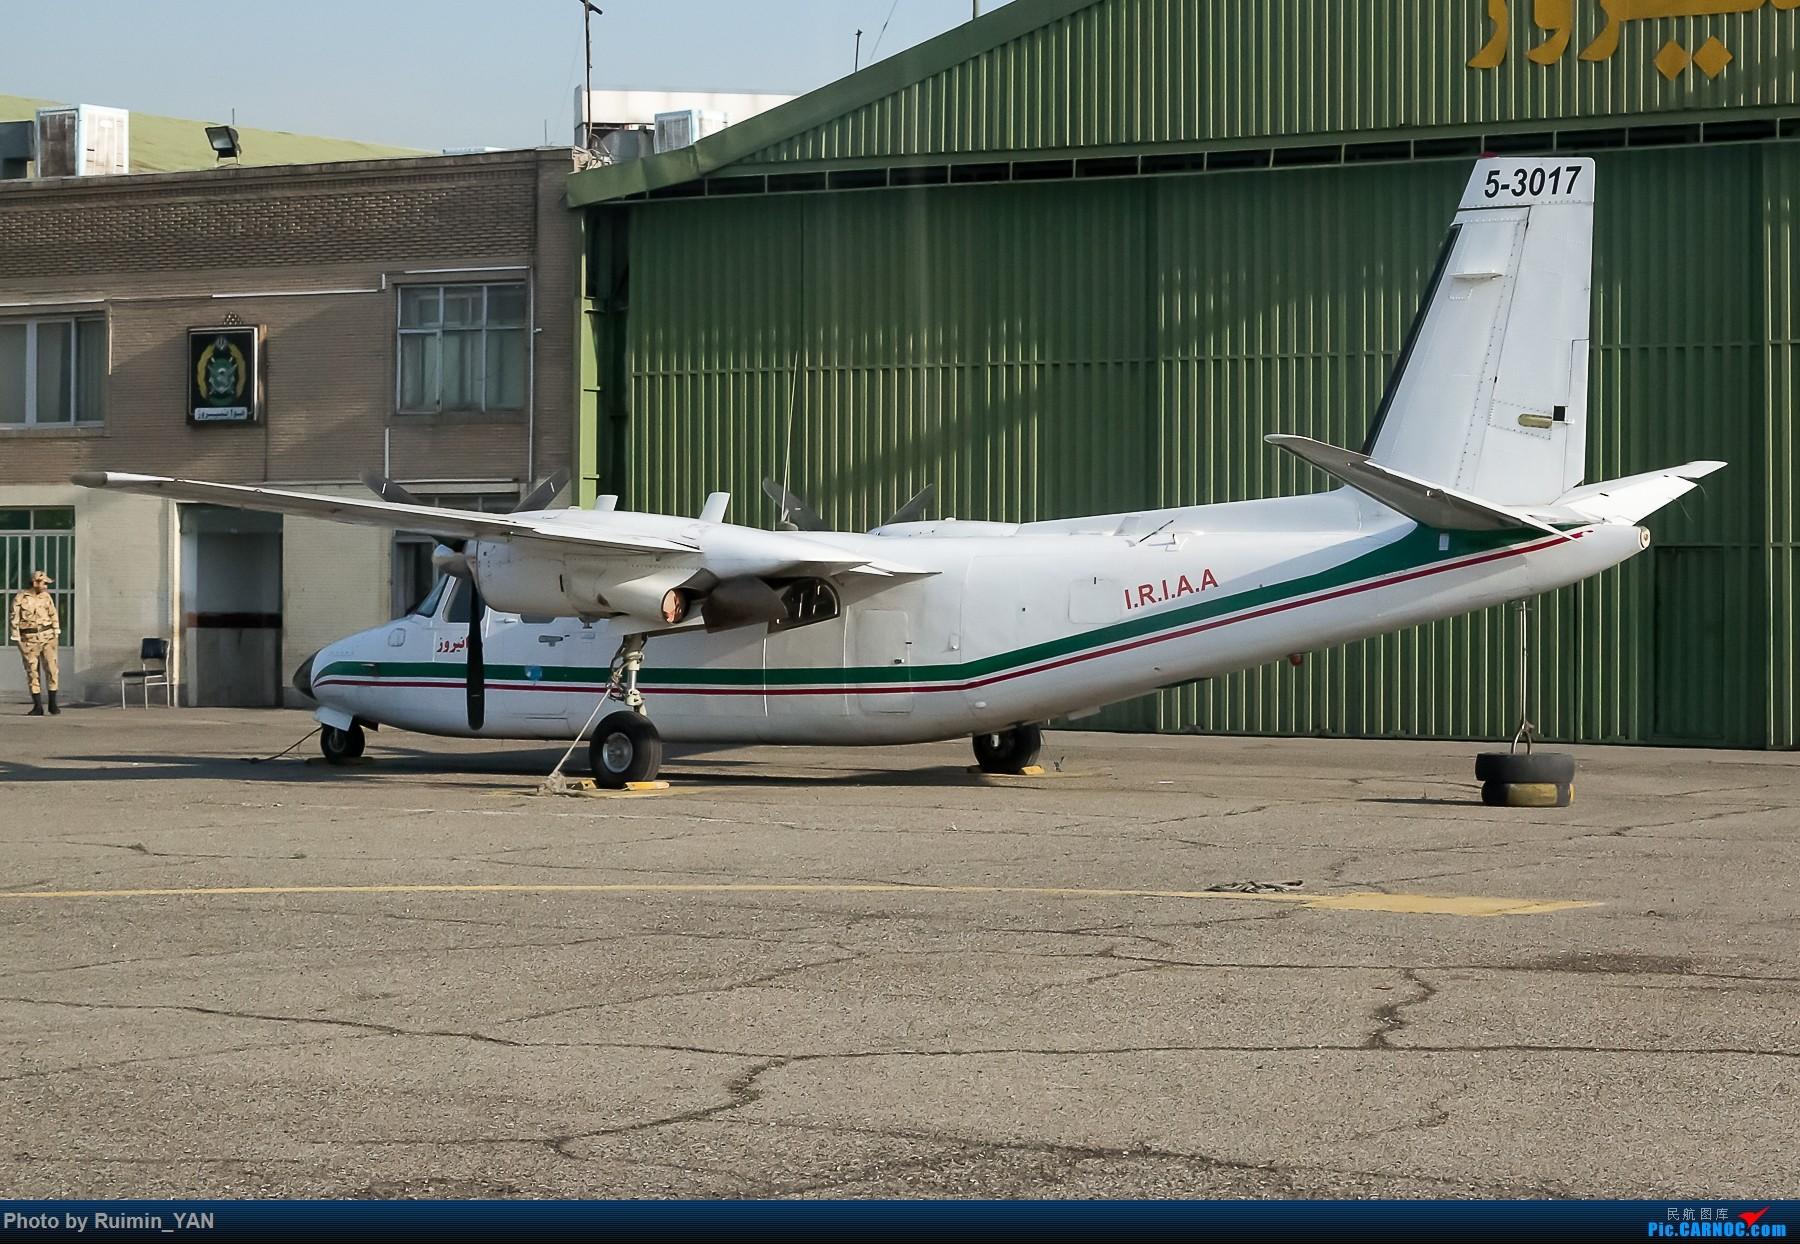 【THR】(德黑兰梅赫拉巴德机场)伊朗空军--Rockwell 690A Turbo Commander ROCKWELL 690A TURBO COMMANDER 5-3017 伊朗德黑兰机场